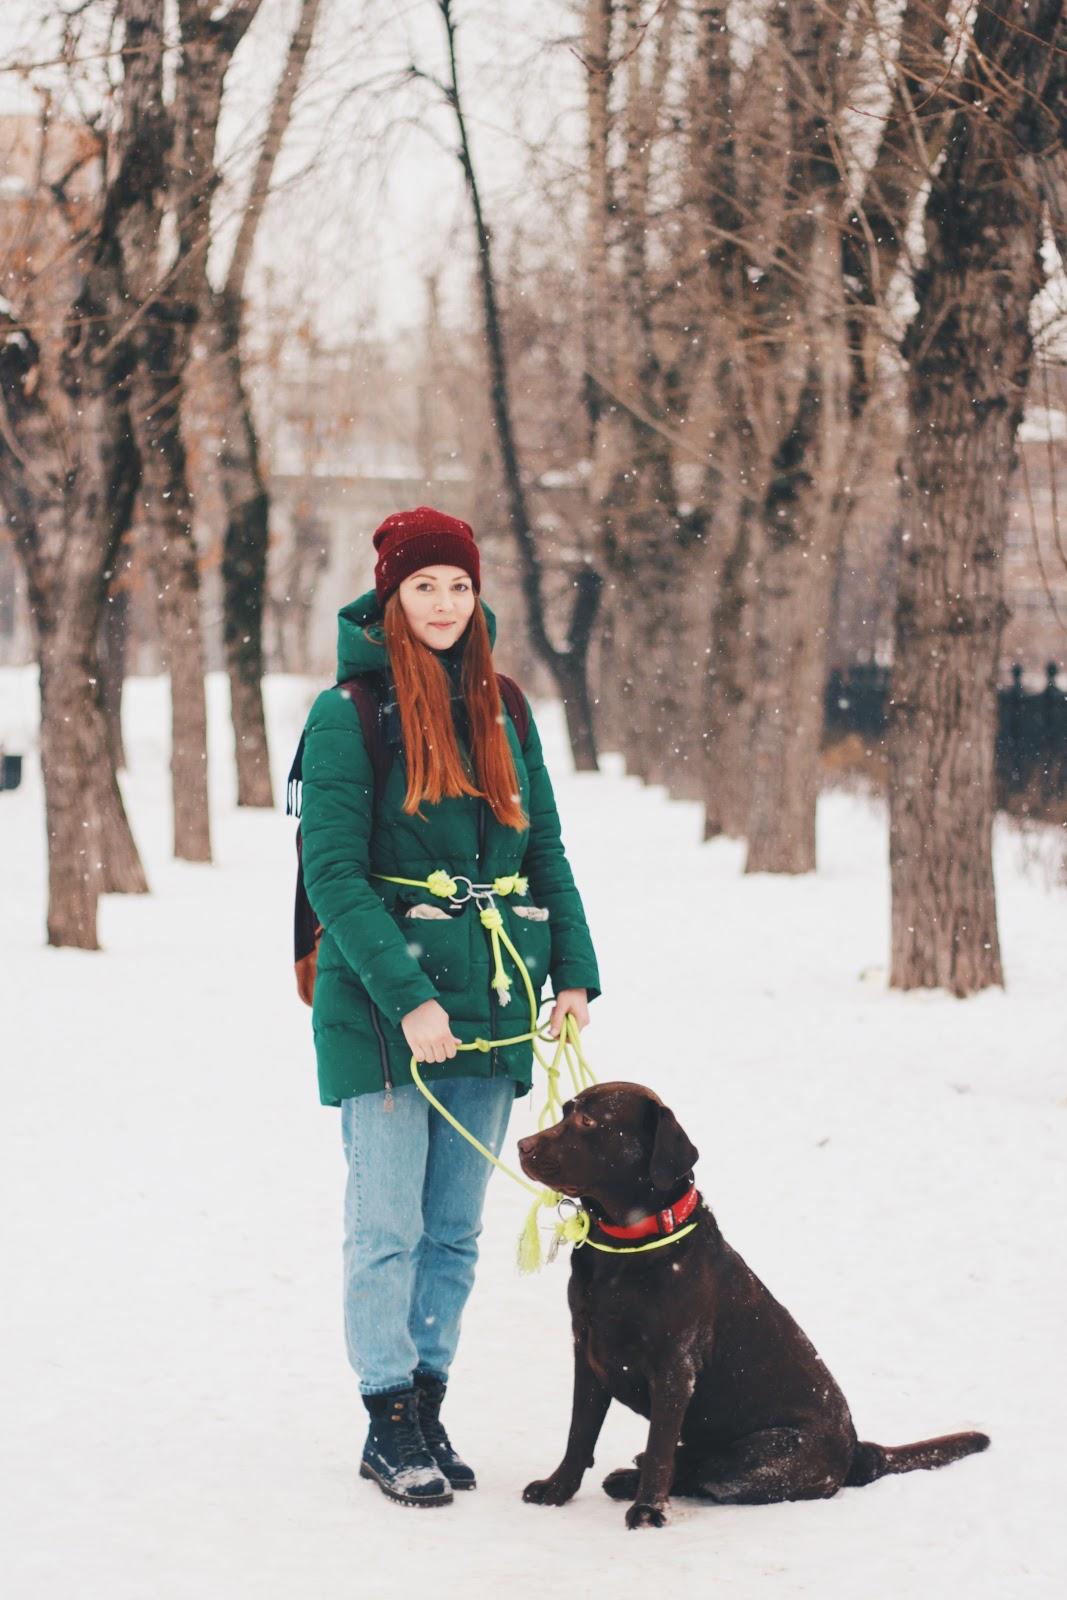 Как работает сервис по выгулу собак «Собака-гуляка» - 6